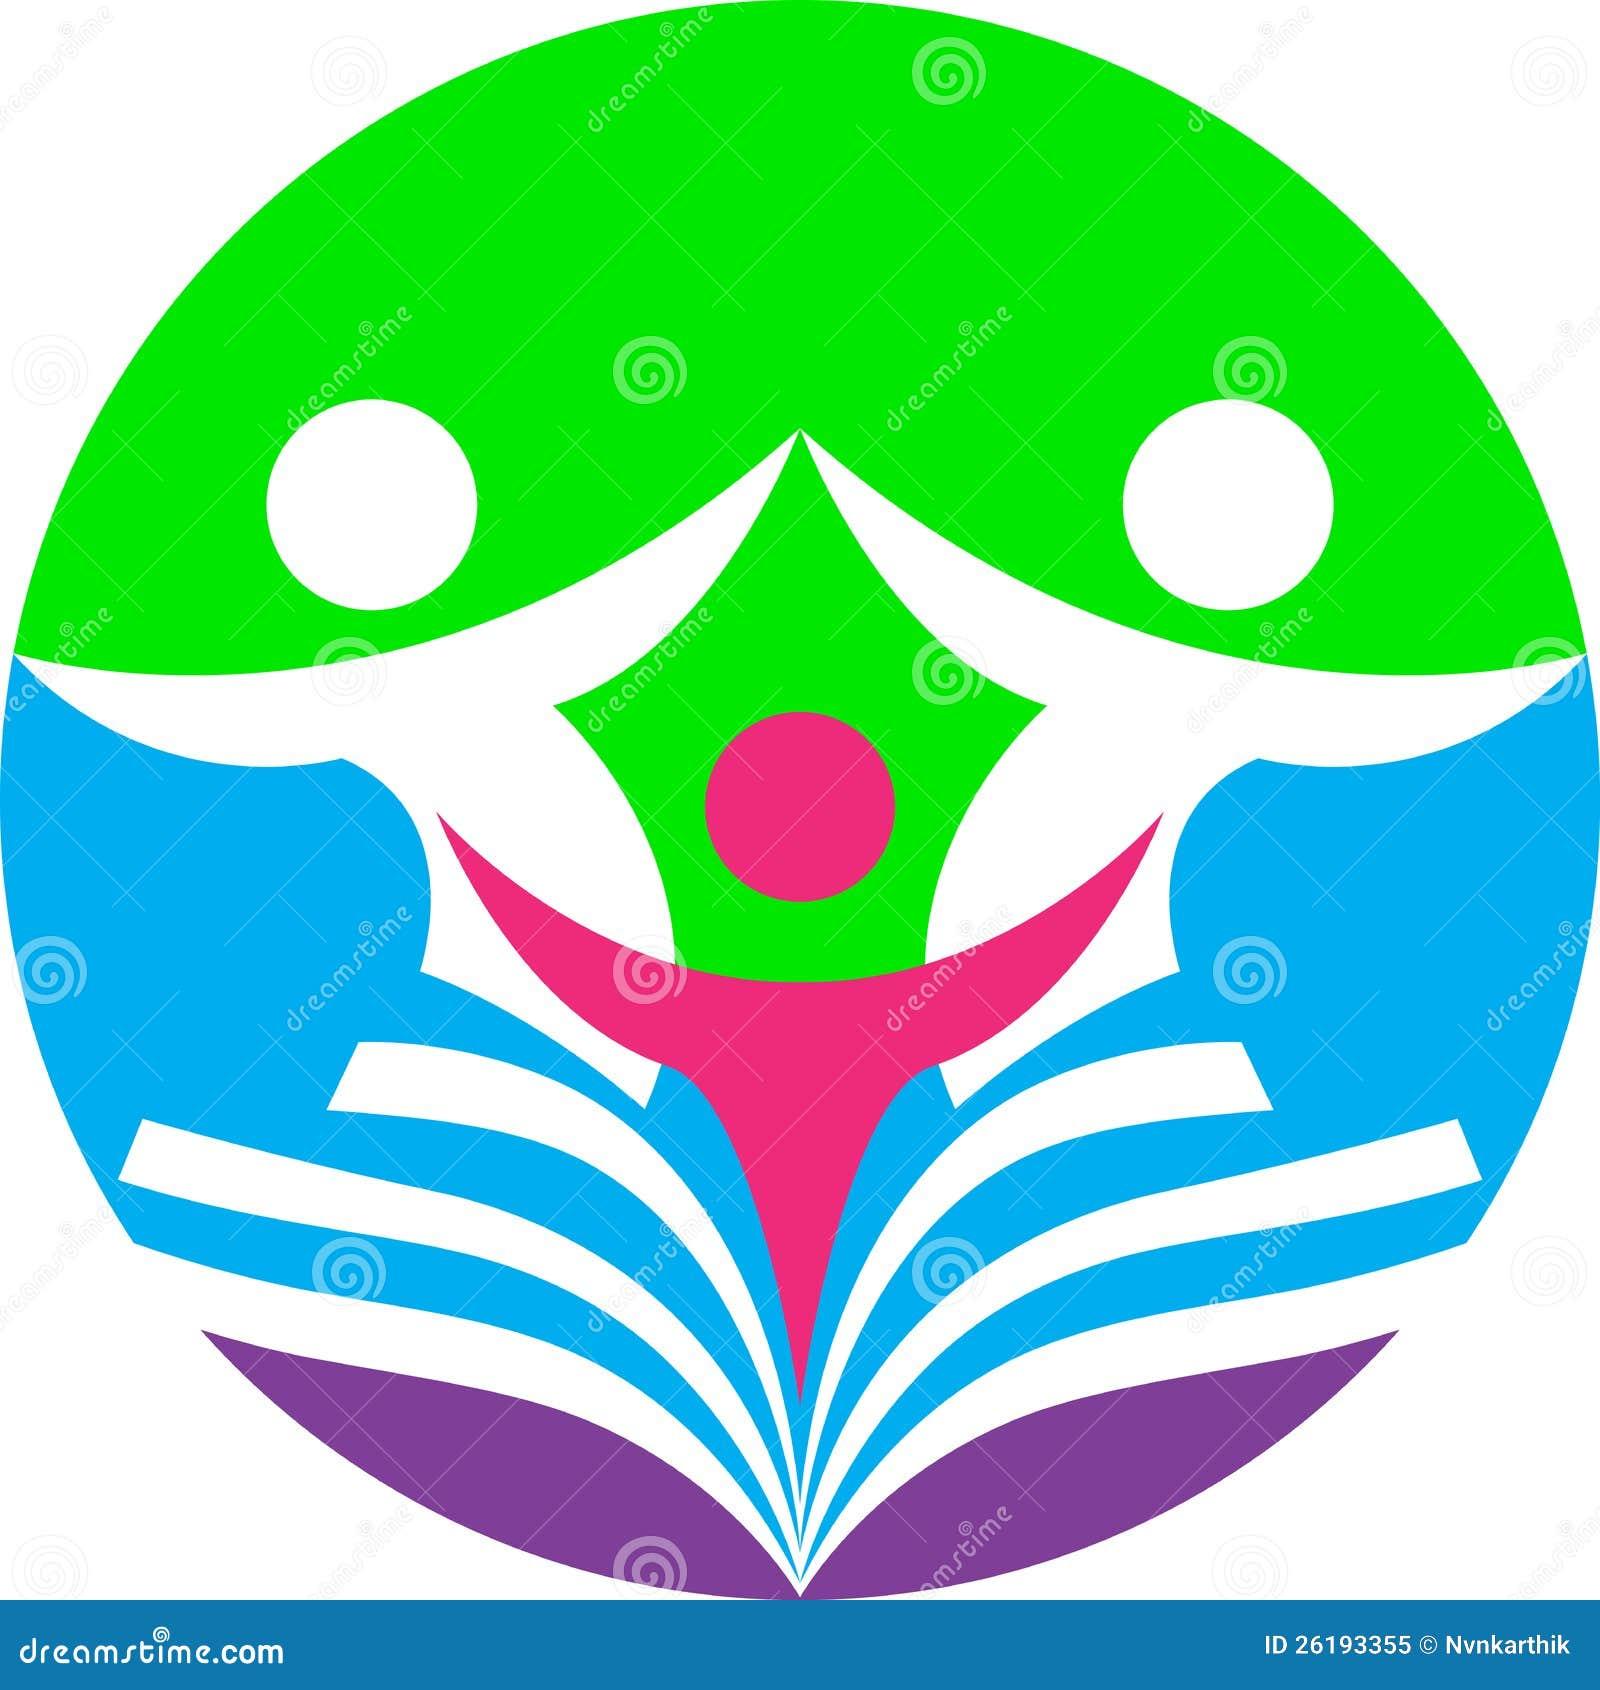 education and training logo stock vector illustration of emblem